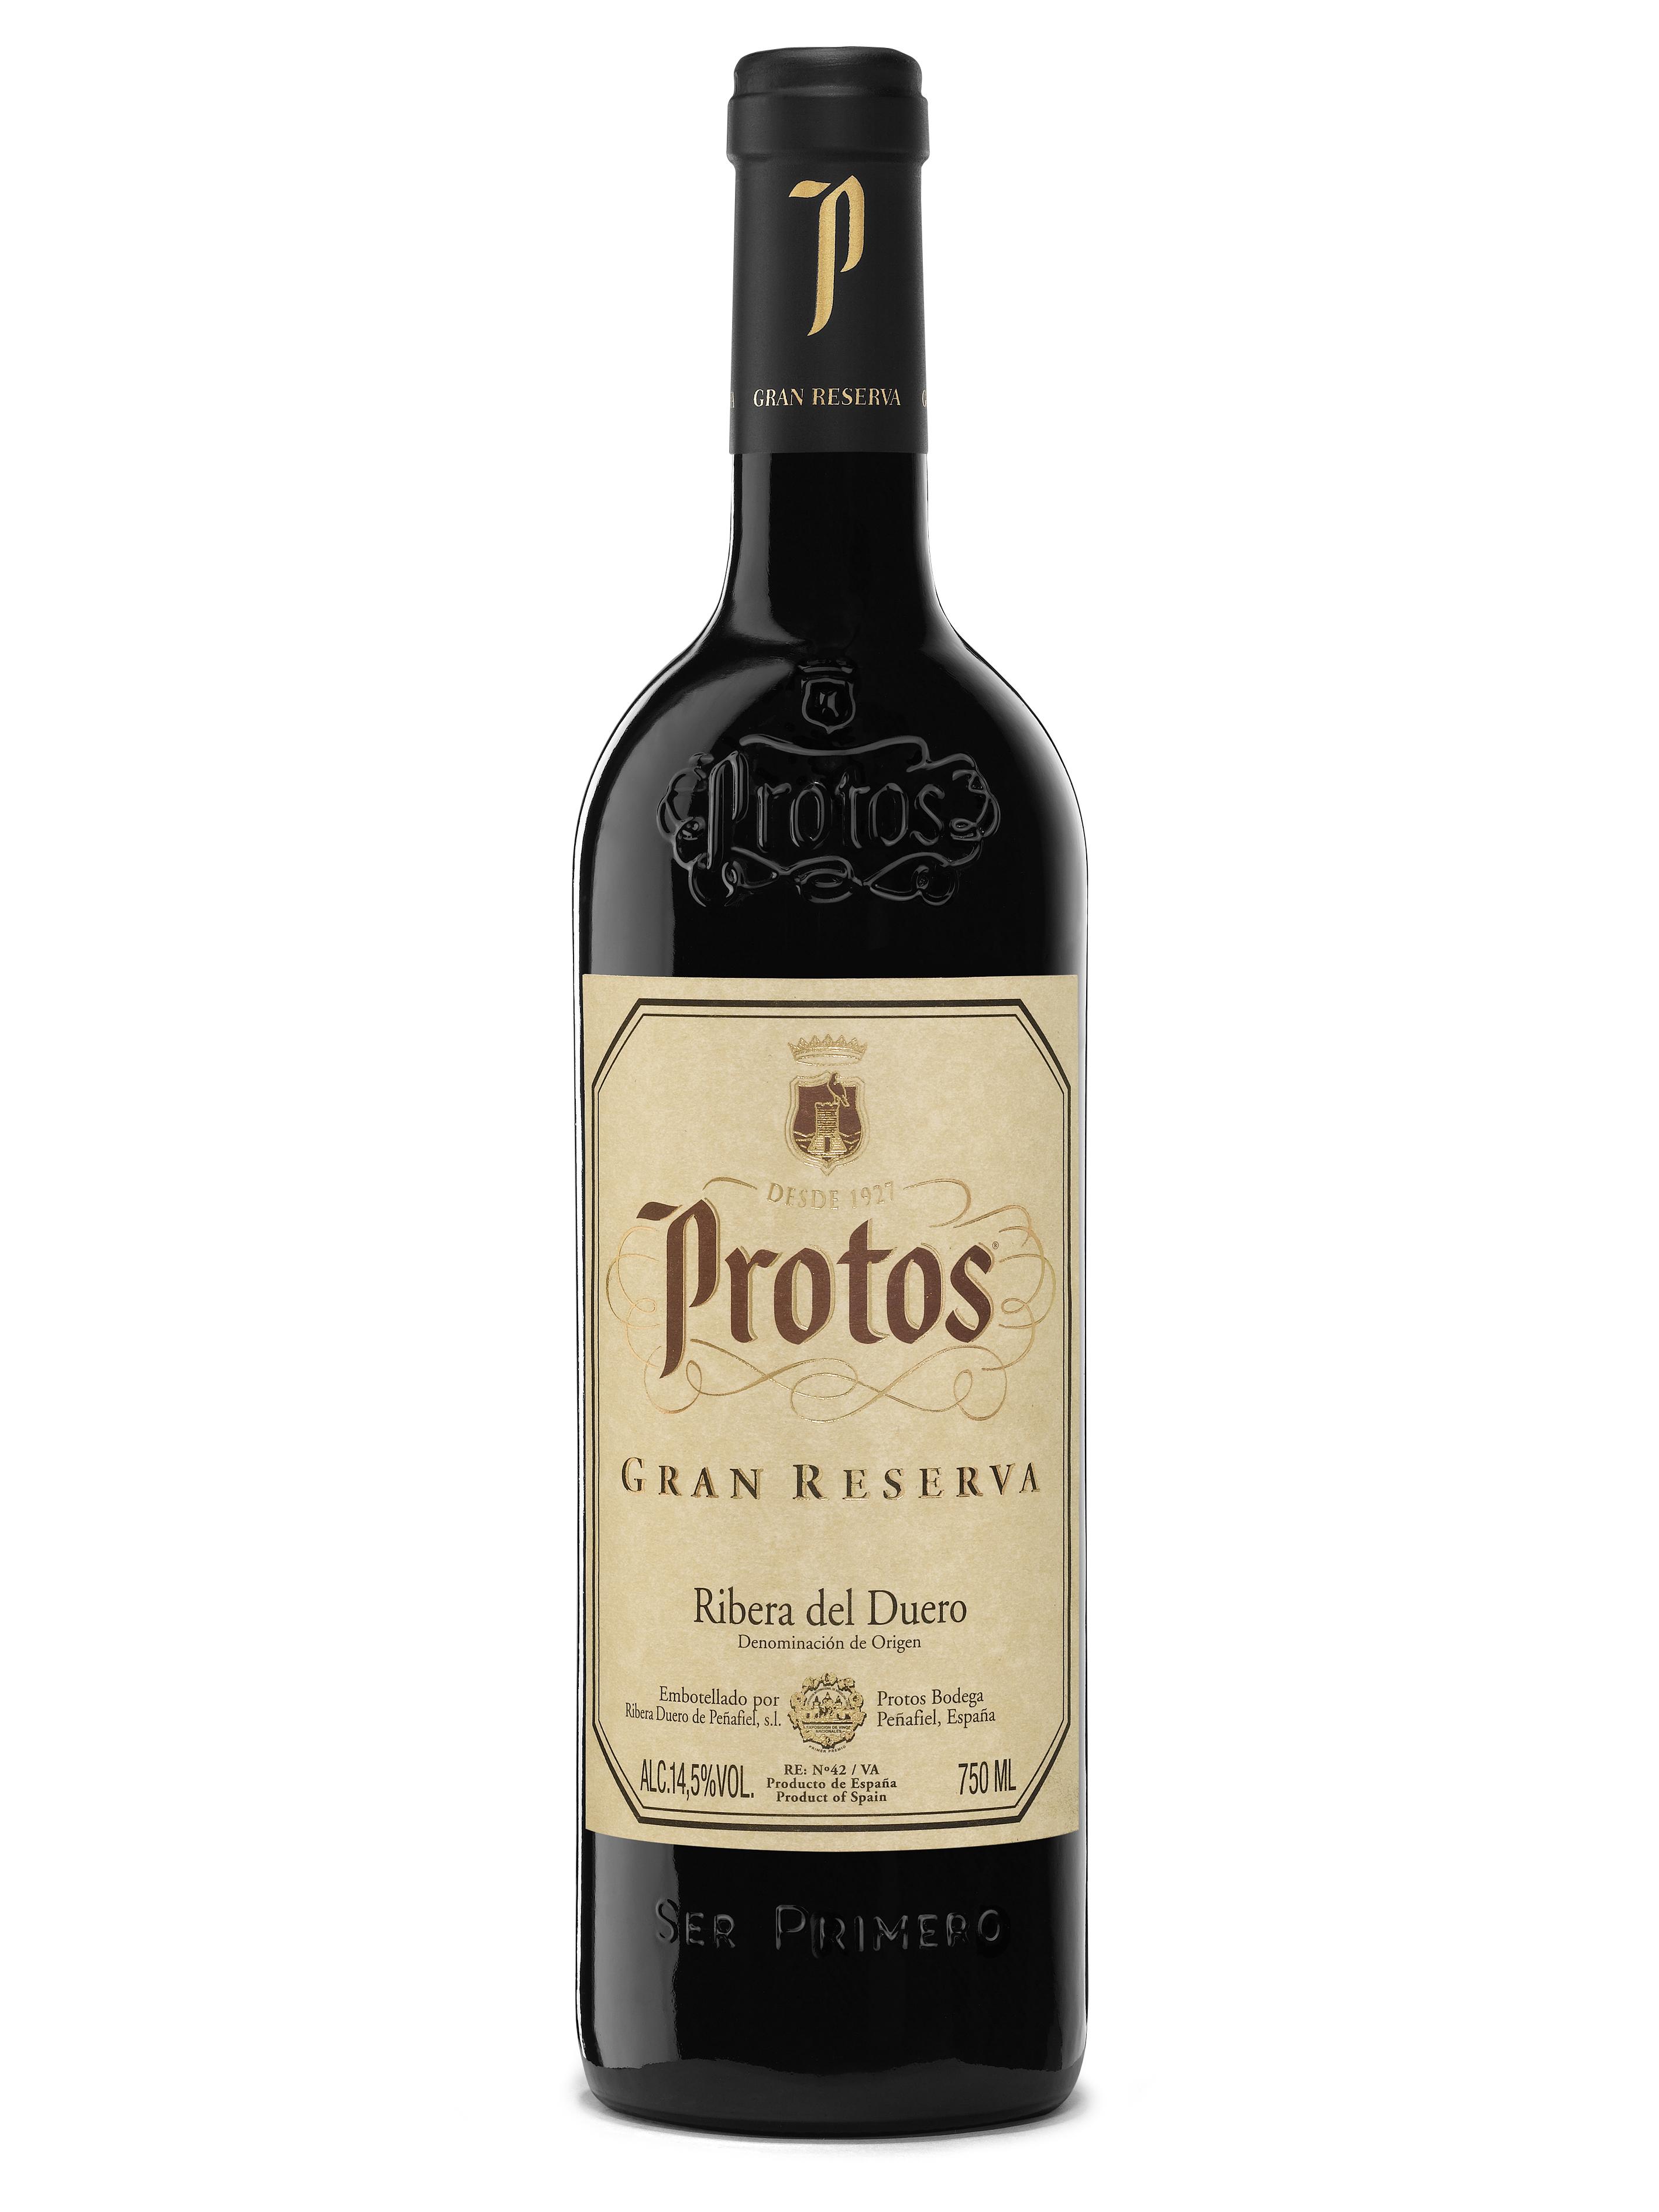 Protos Gran Reserva